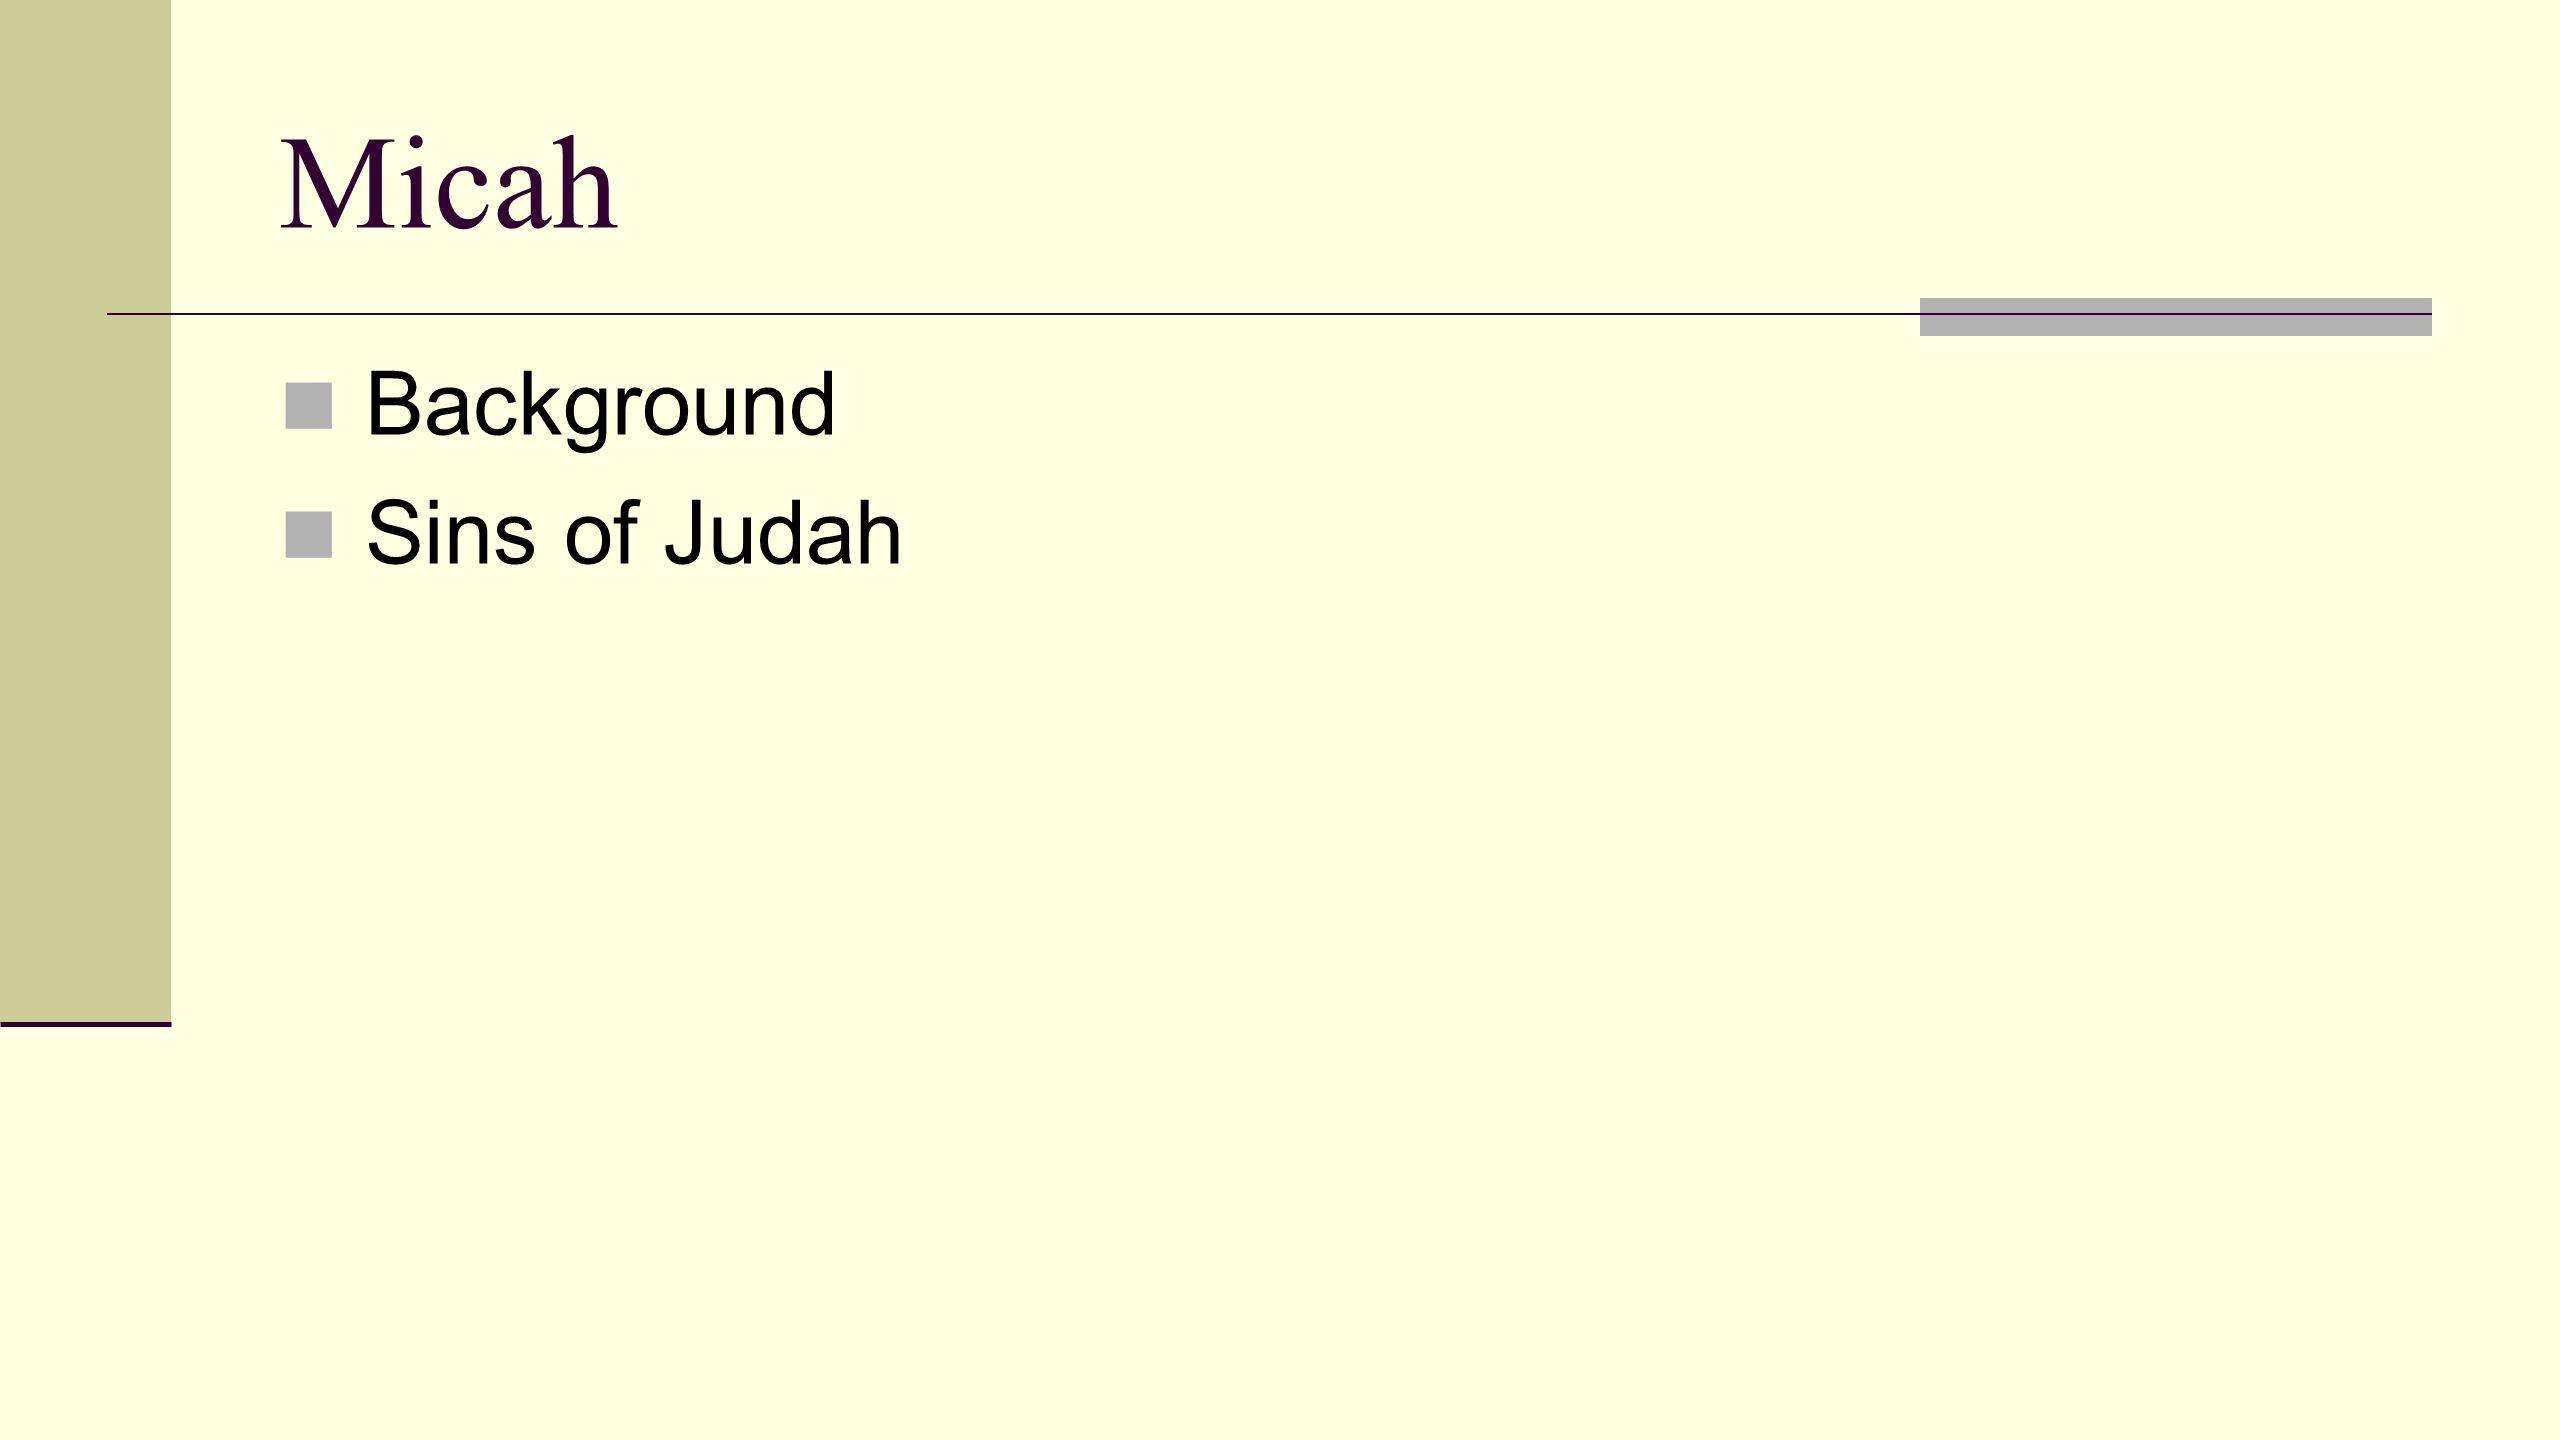 Micah Background Sins of Judah Judgments Promised restoration God will preserve a remnant (2:12, 5:7-8)